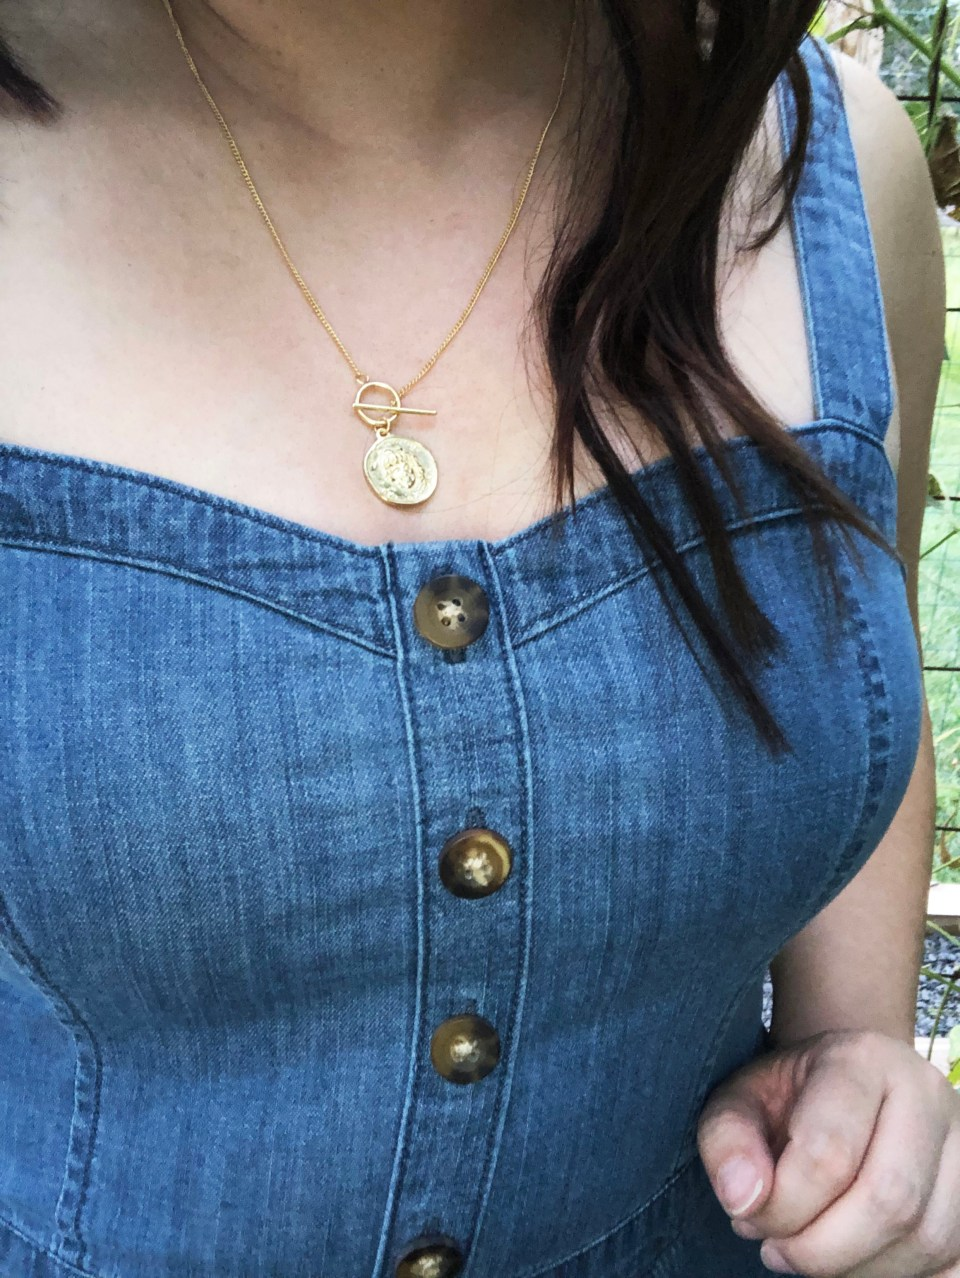 Denim Jumpsuit & Coin Toggle Necklace 11